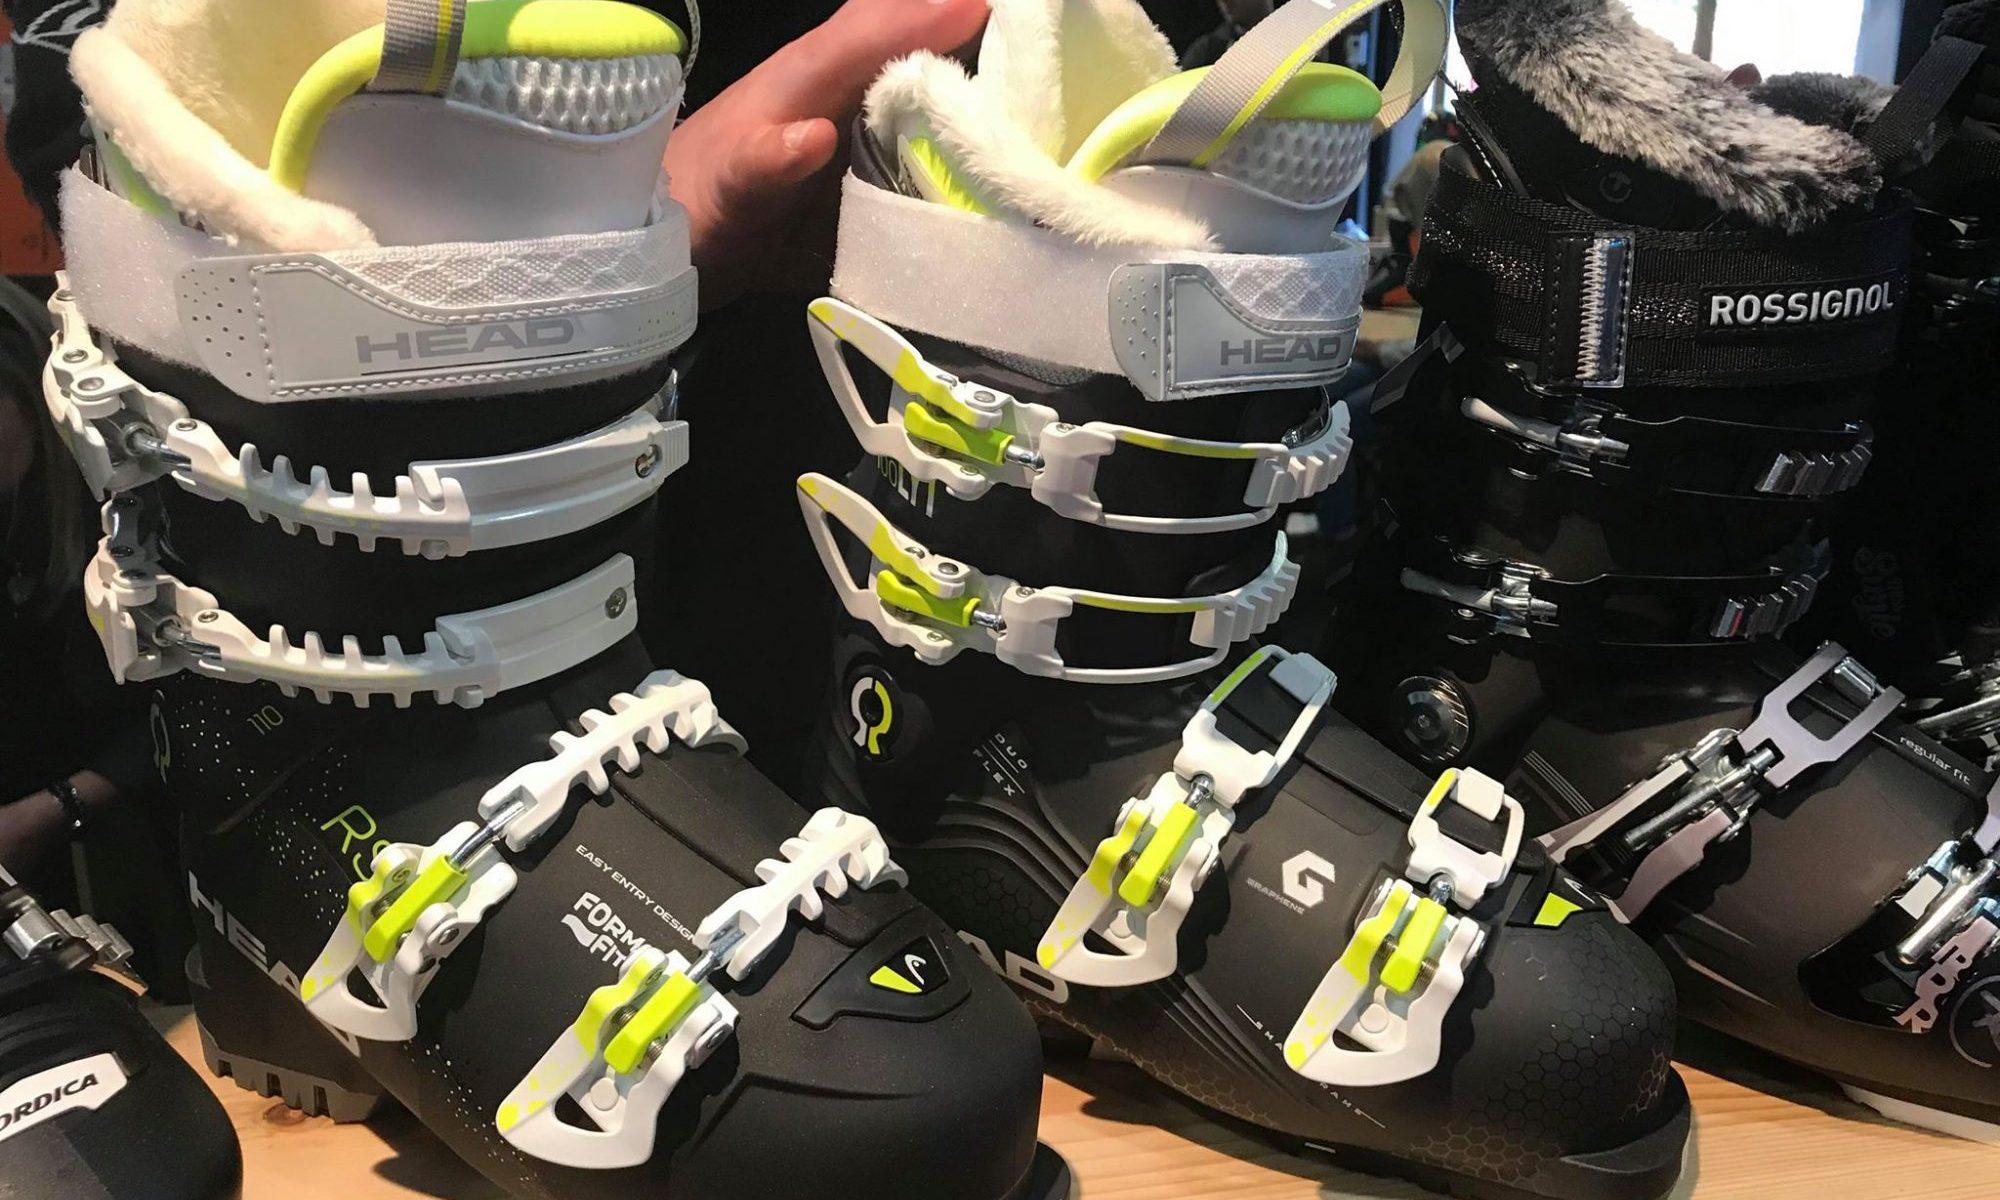 Head Vector Ski Boot 2019- sold at Finches Emporium. Telegraph Ski and Snowboard Show. Photo: The-Ski-Guru.